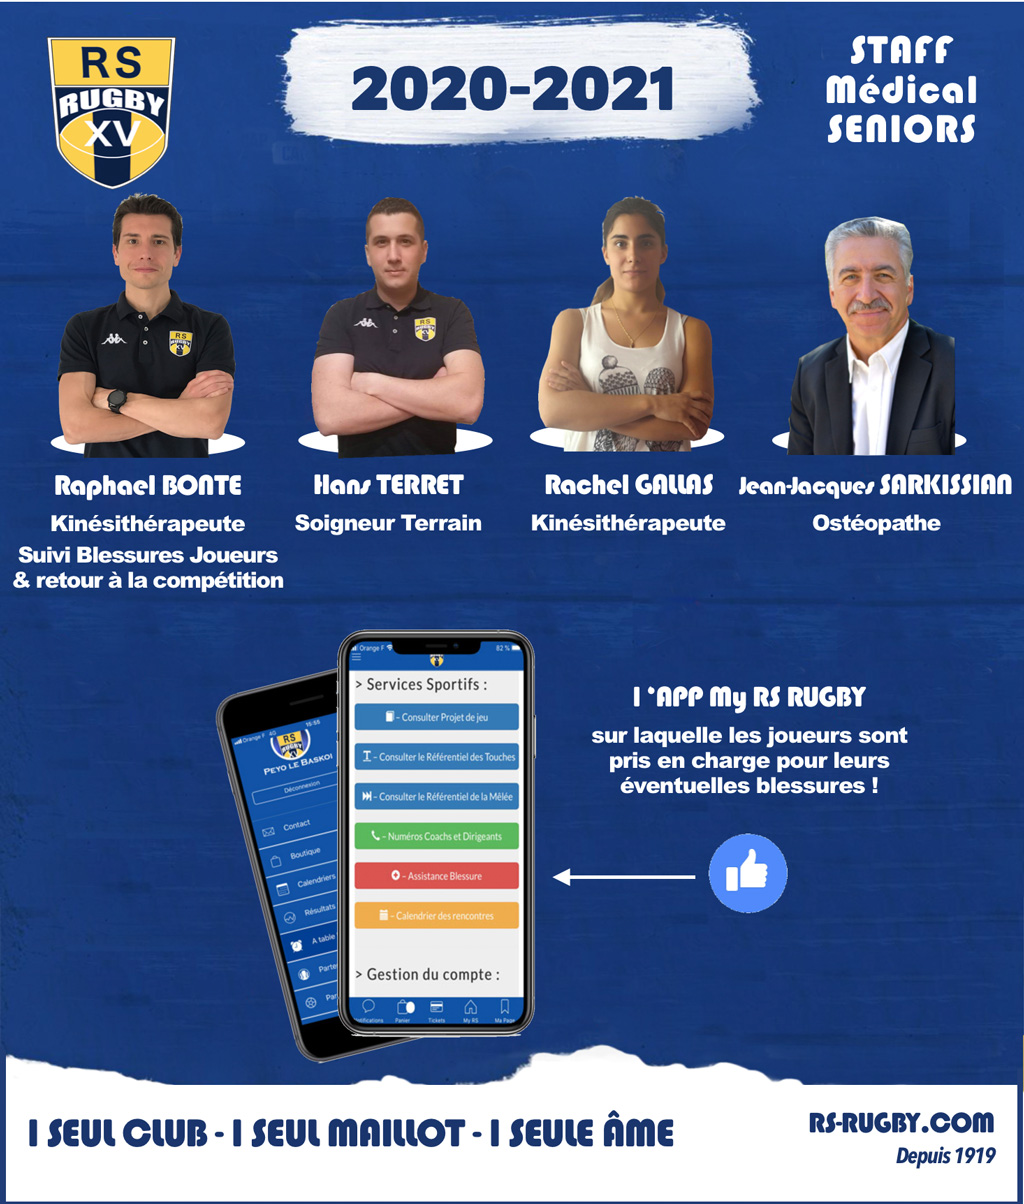 Rugby-Lyon_Staff_Medical_Seniors